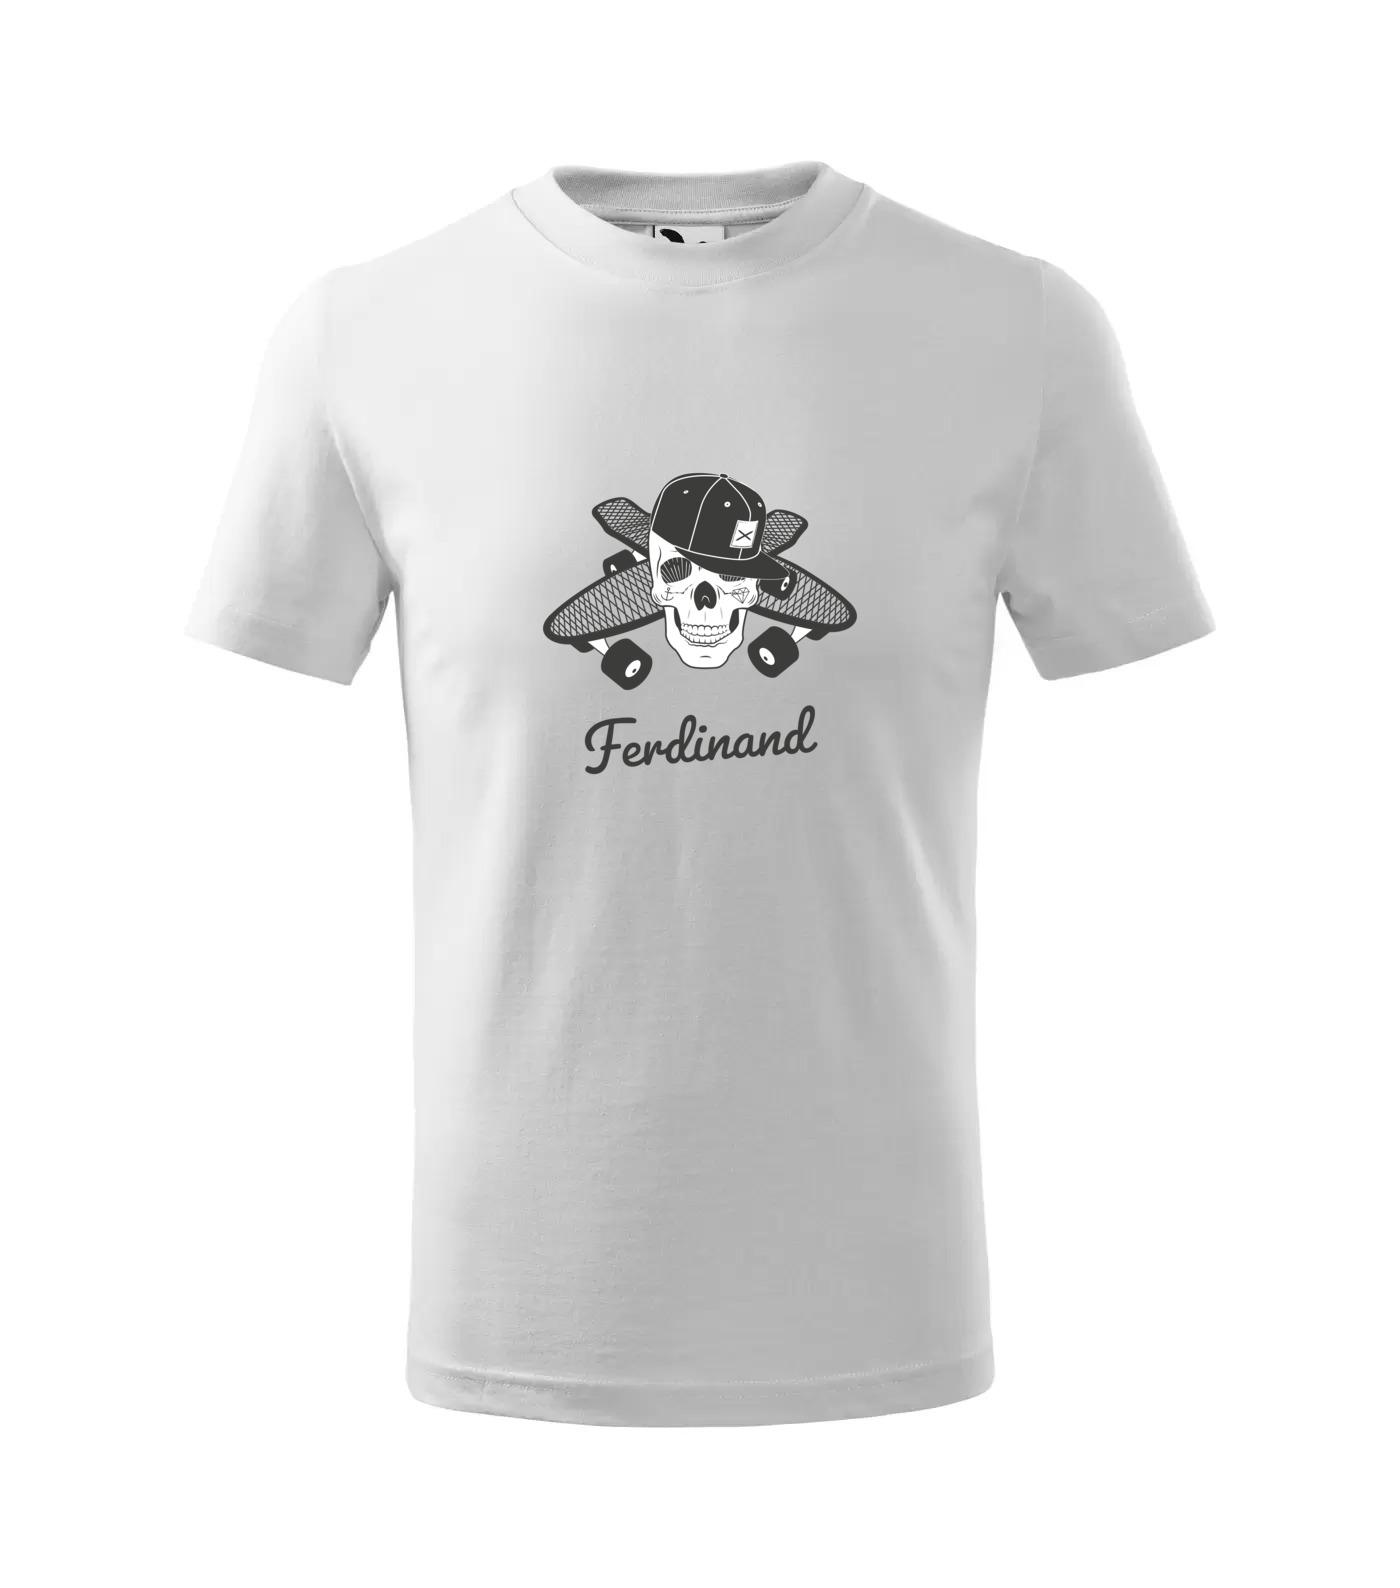 Tričko Skejťák Ferdinand